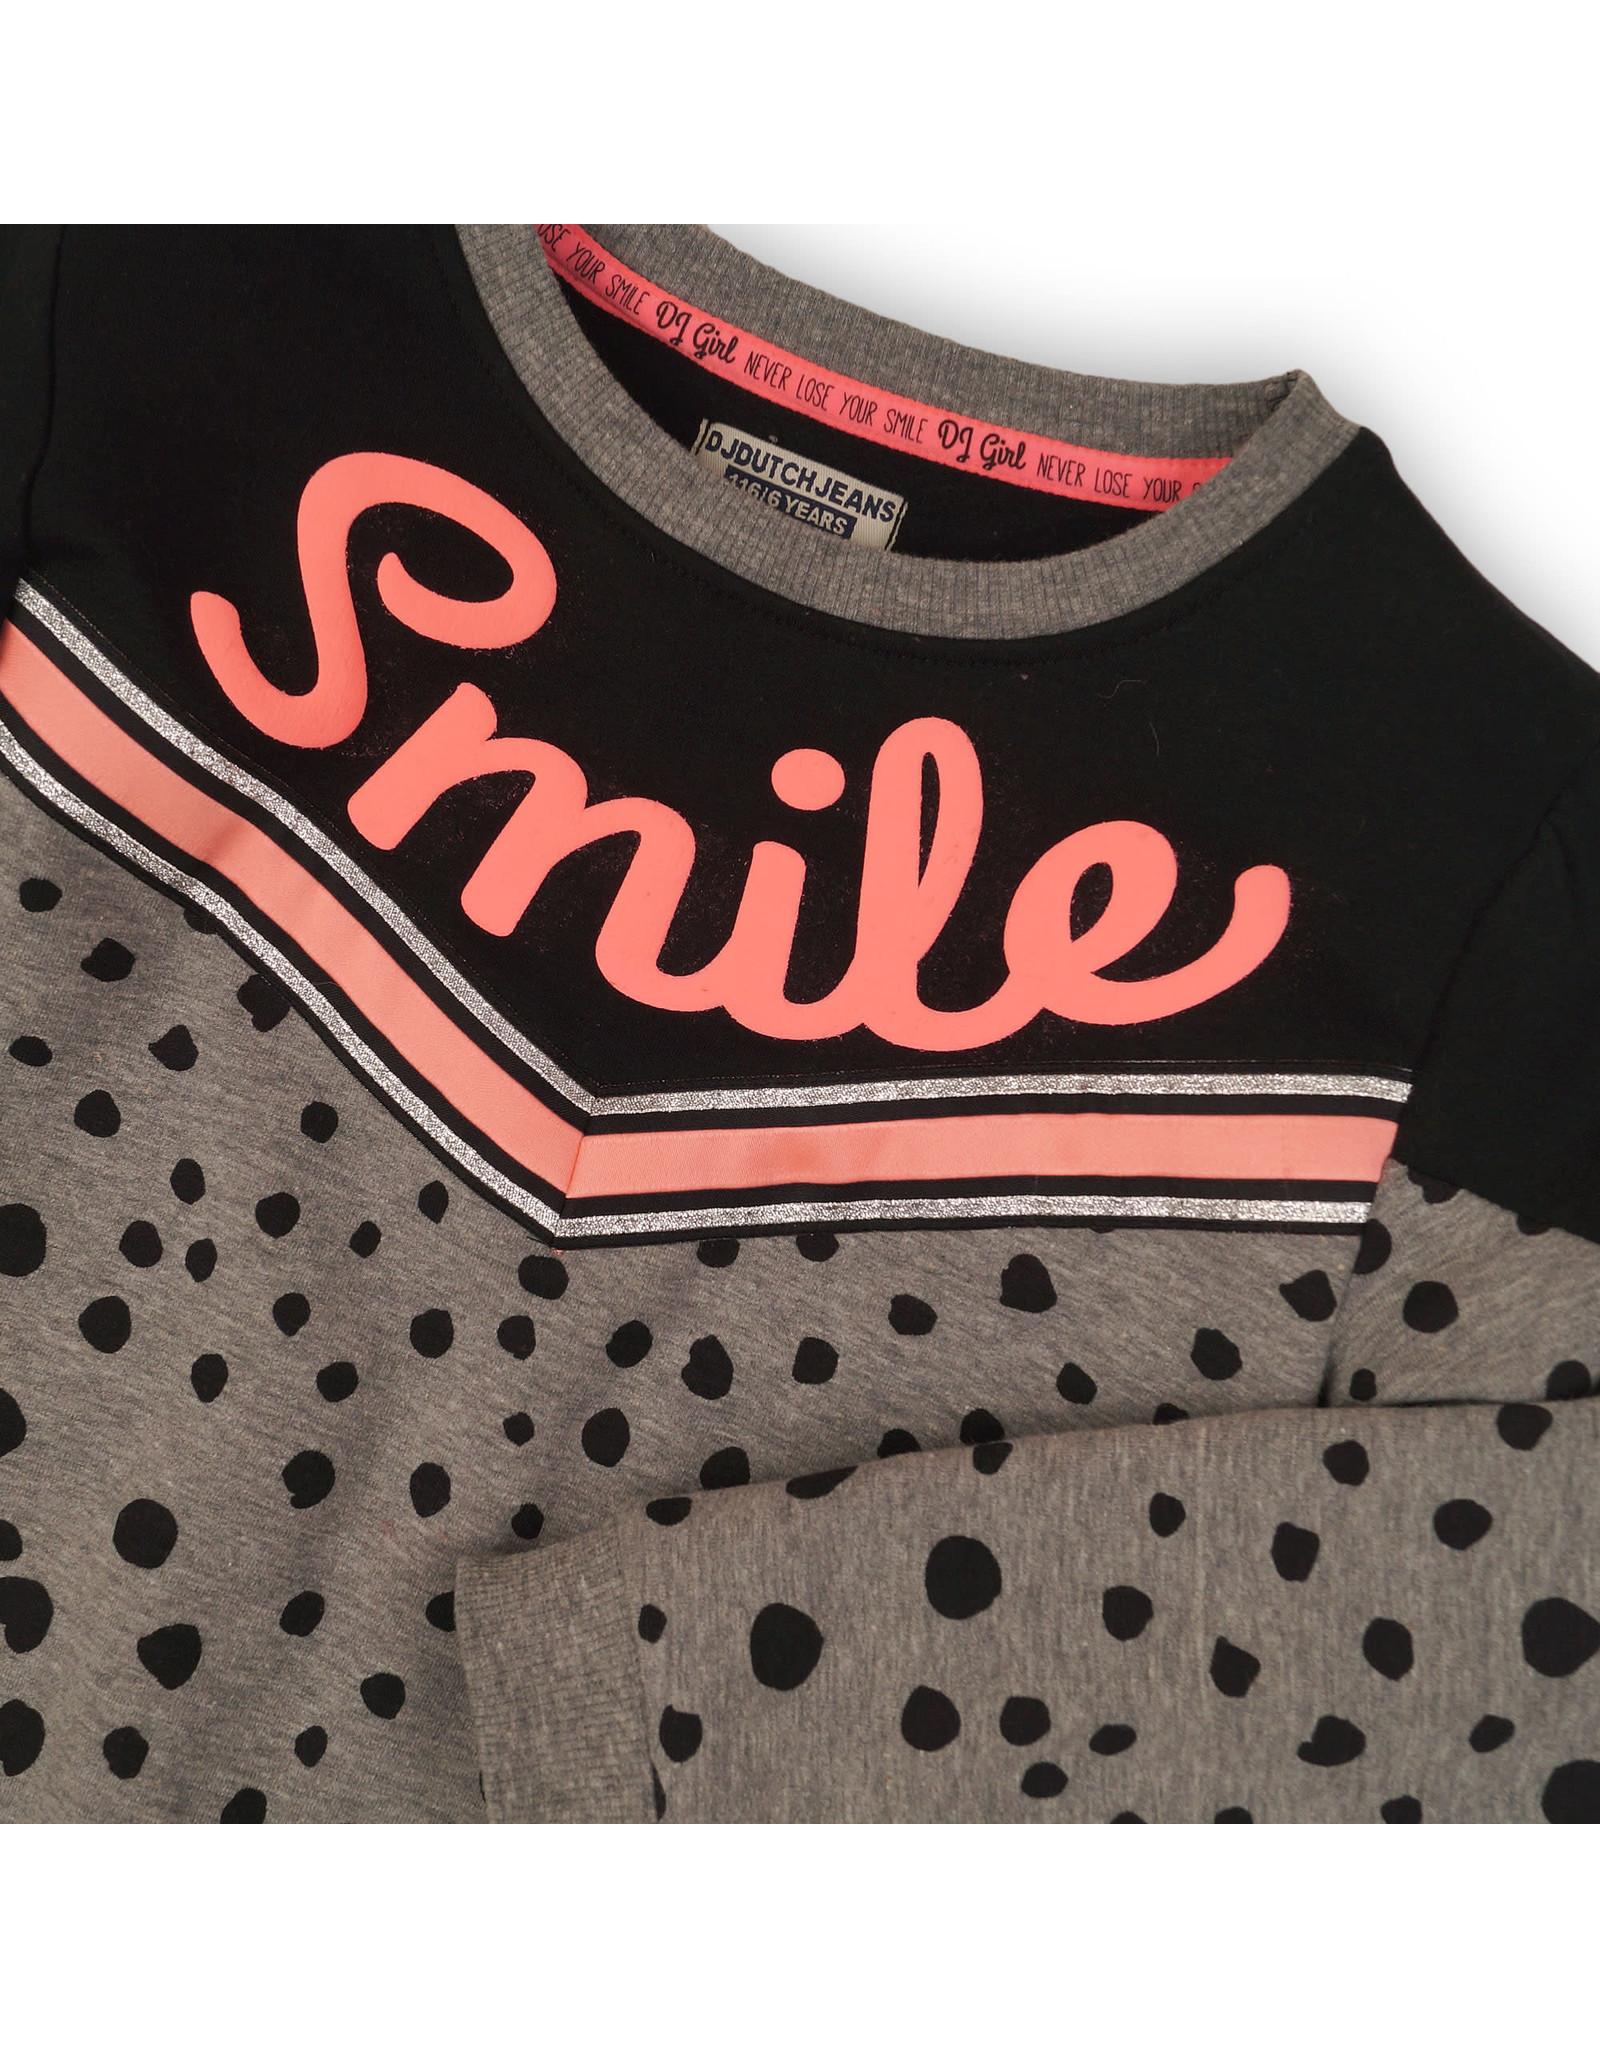 DJ Dutchjeans DJ Dutchjeans meiden sweater NEVER LOSE YOUR SMILE